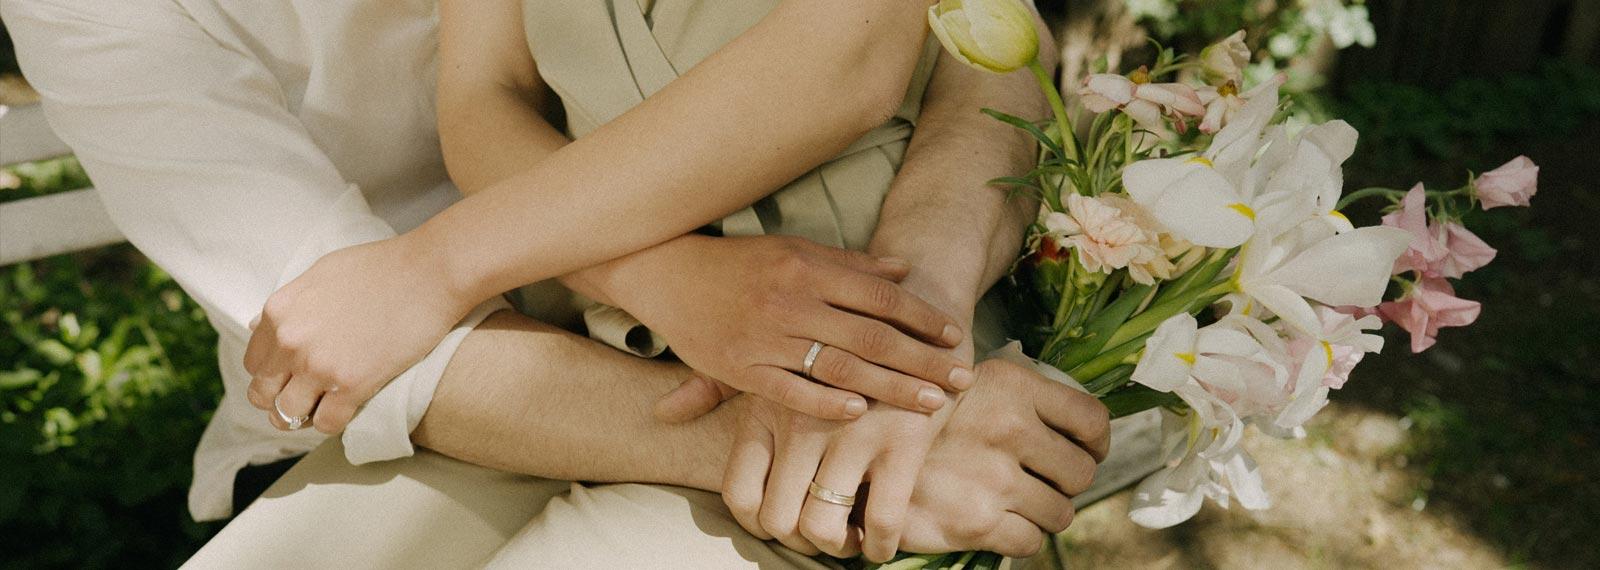 Banner-Ines-Bouwen-people-holding-hands